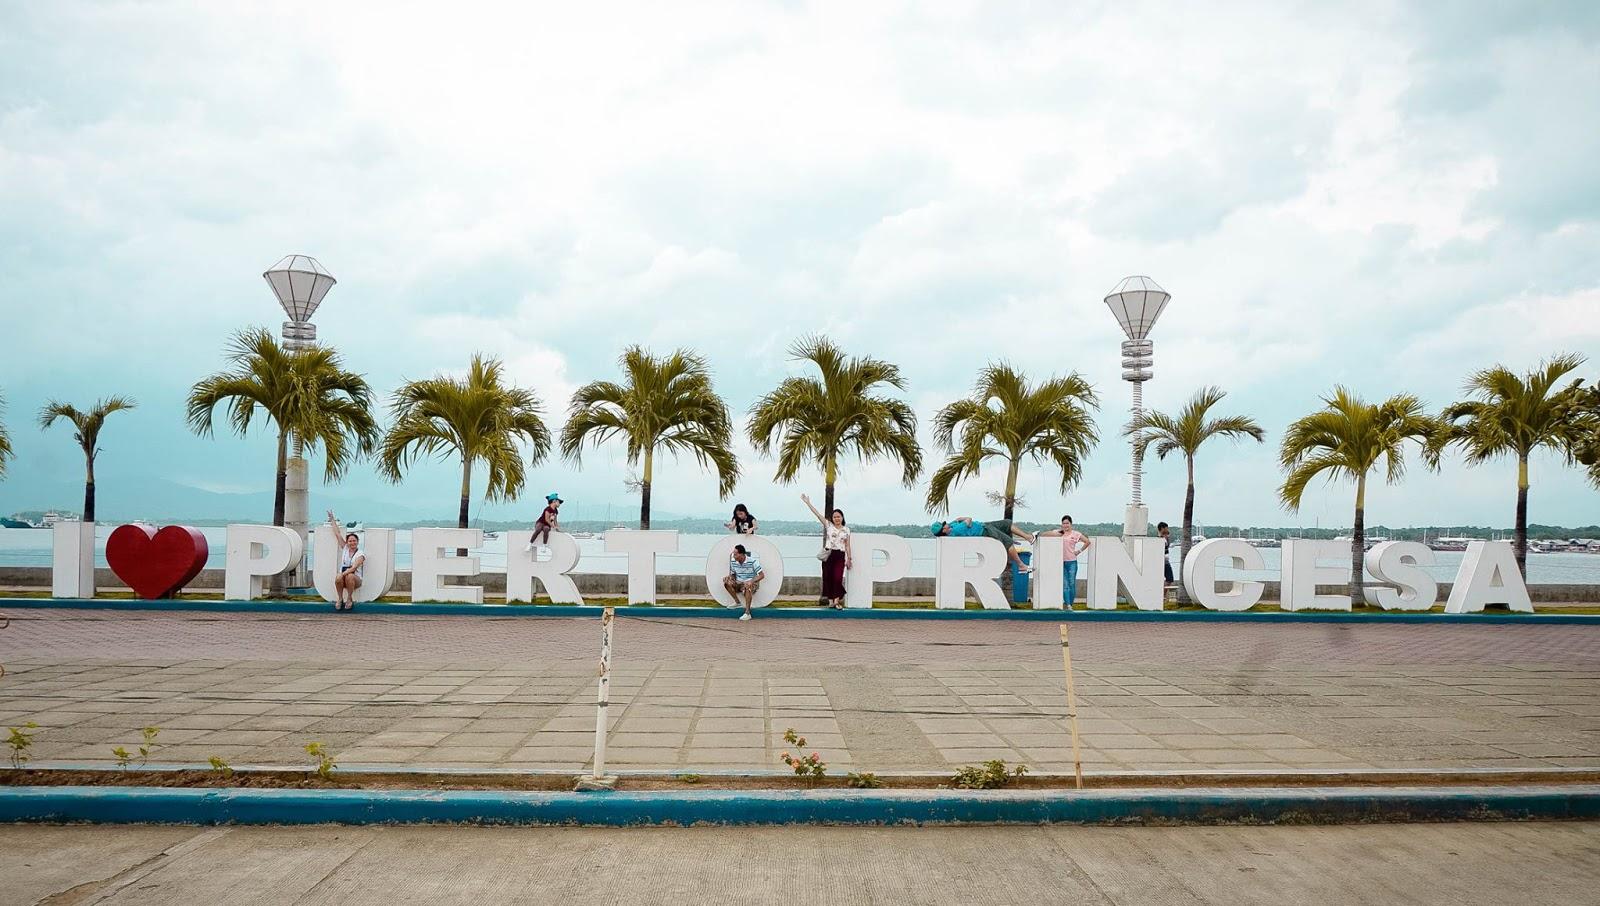 guide to Puerto Princesa, Palawan; places to visit in Palawan